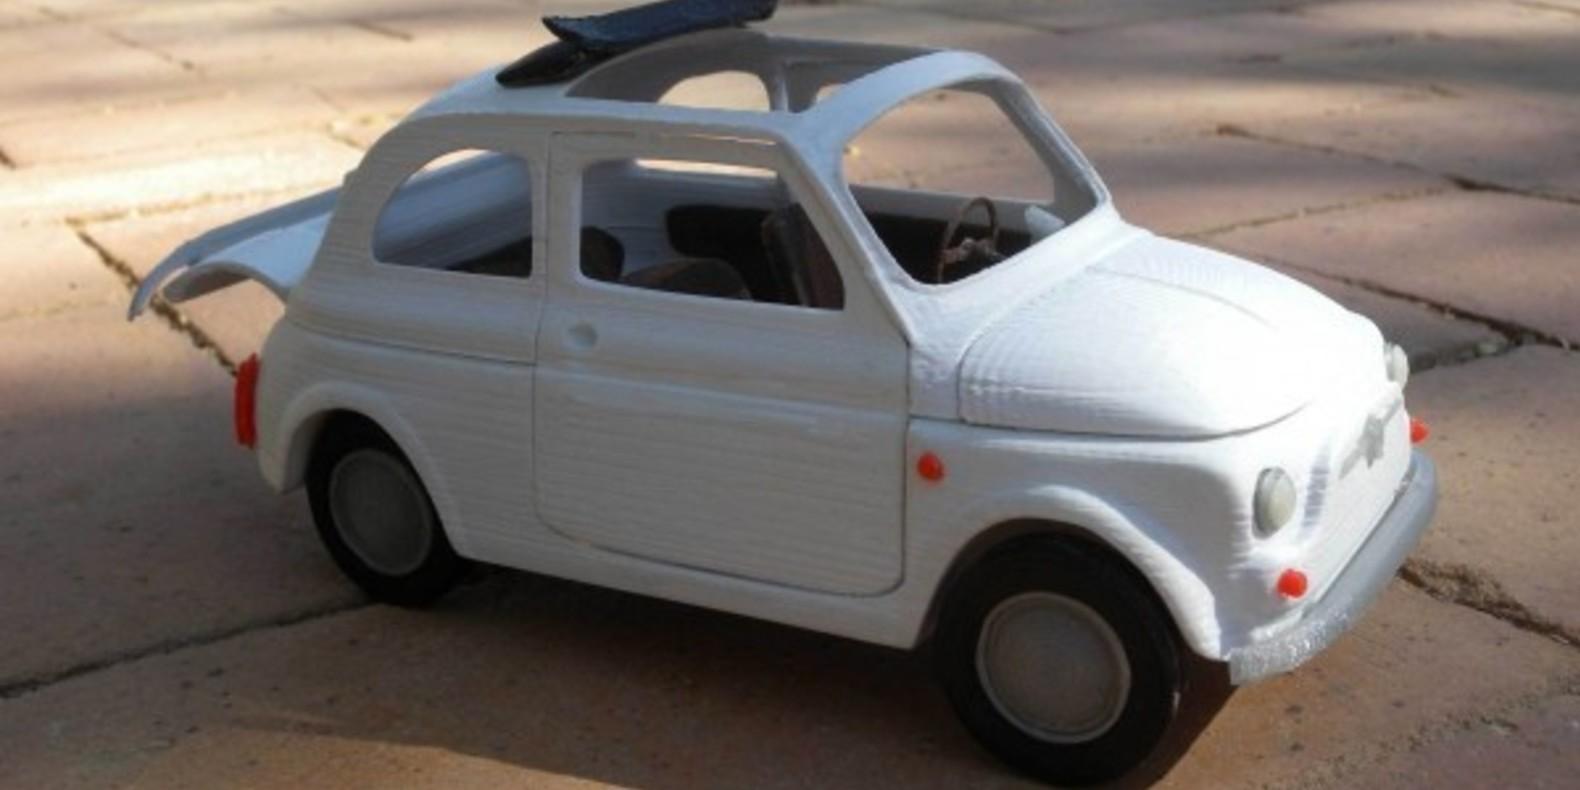 Italian Sixties Car 2 - Mao Casella - Cults modélisme 3D printing Impression 3D Fichier 3D